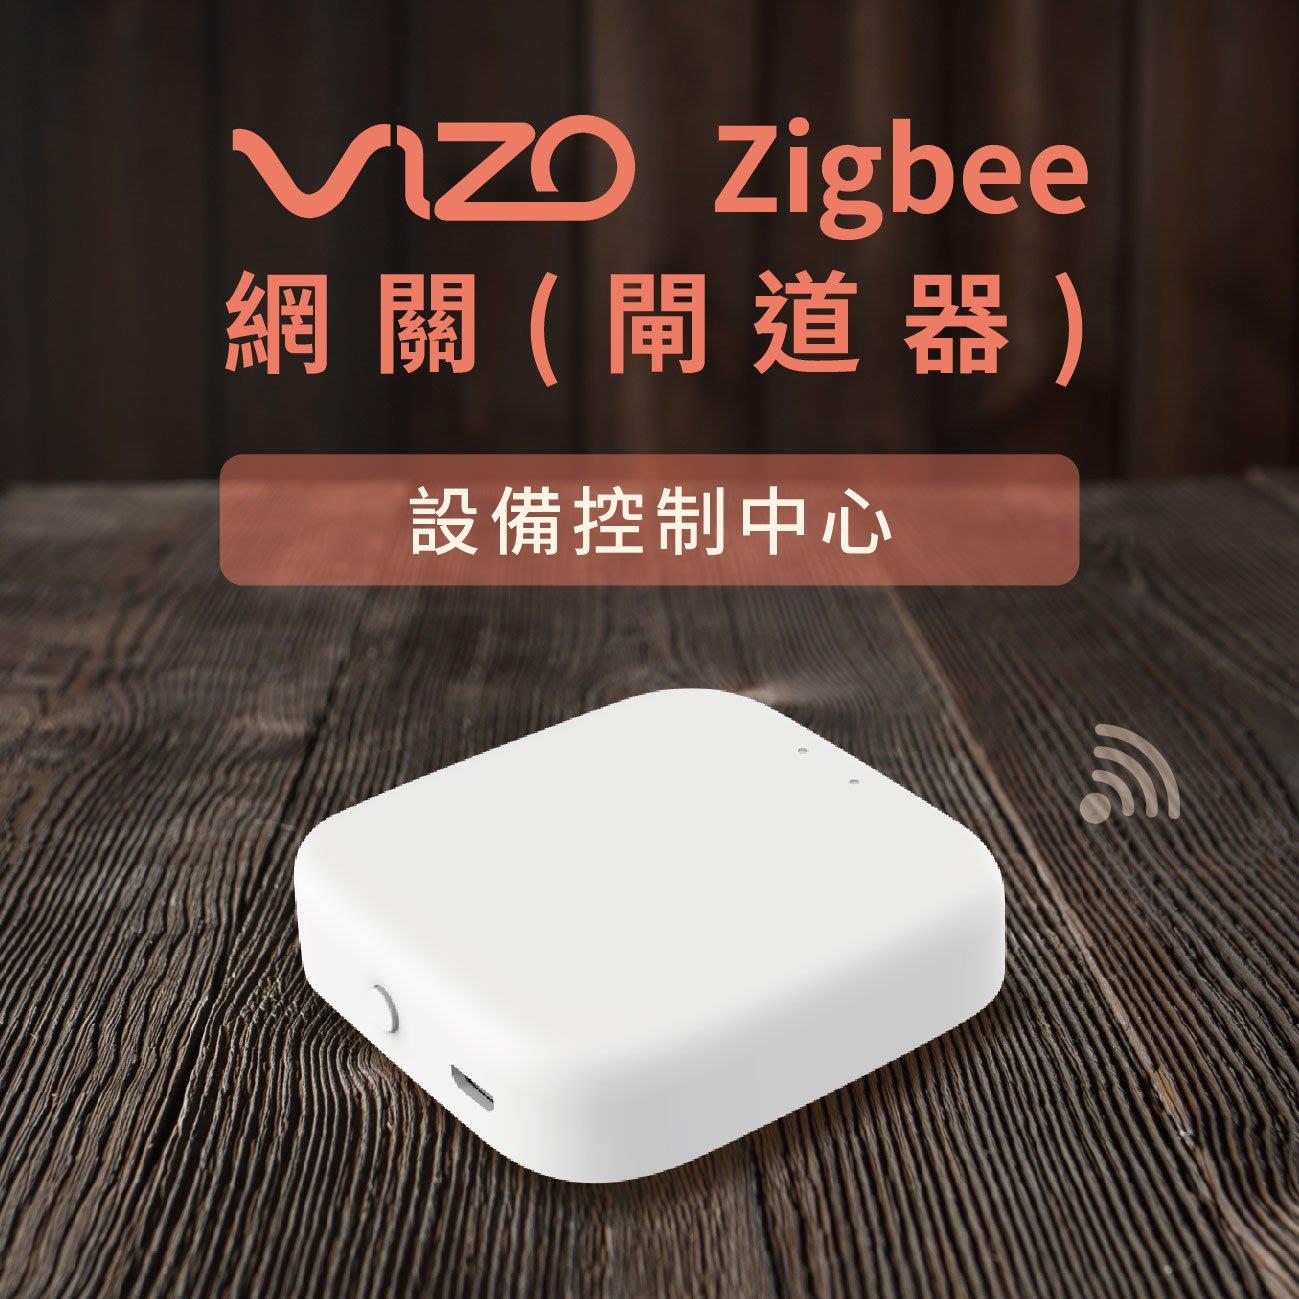 VIZO Zigbee網關(閘道器) 智能網關 Zigbee系列控制中心